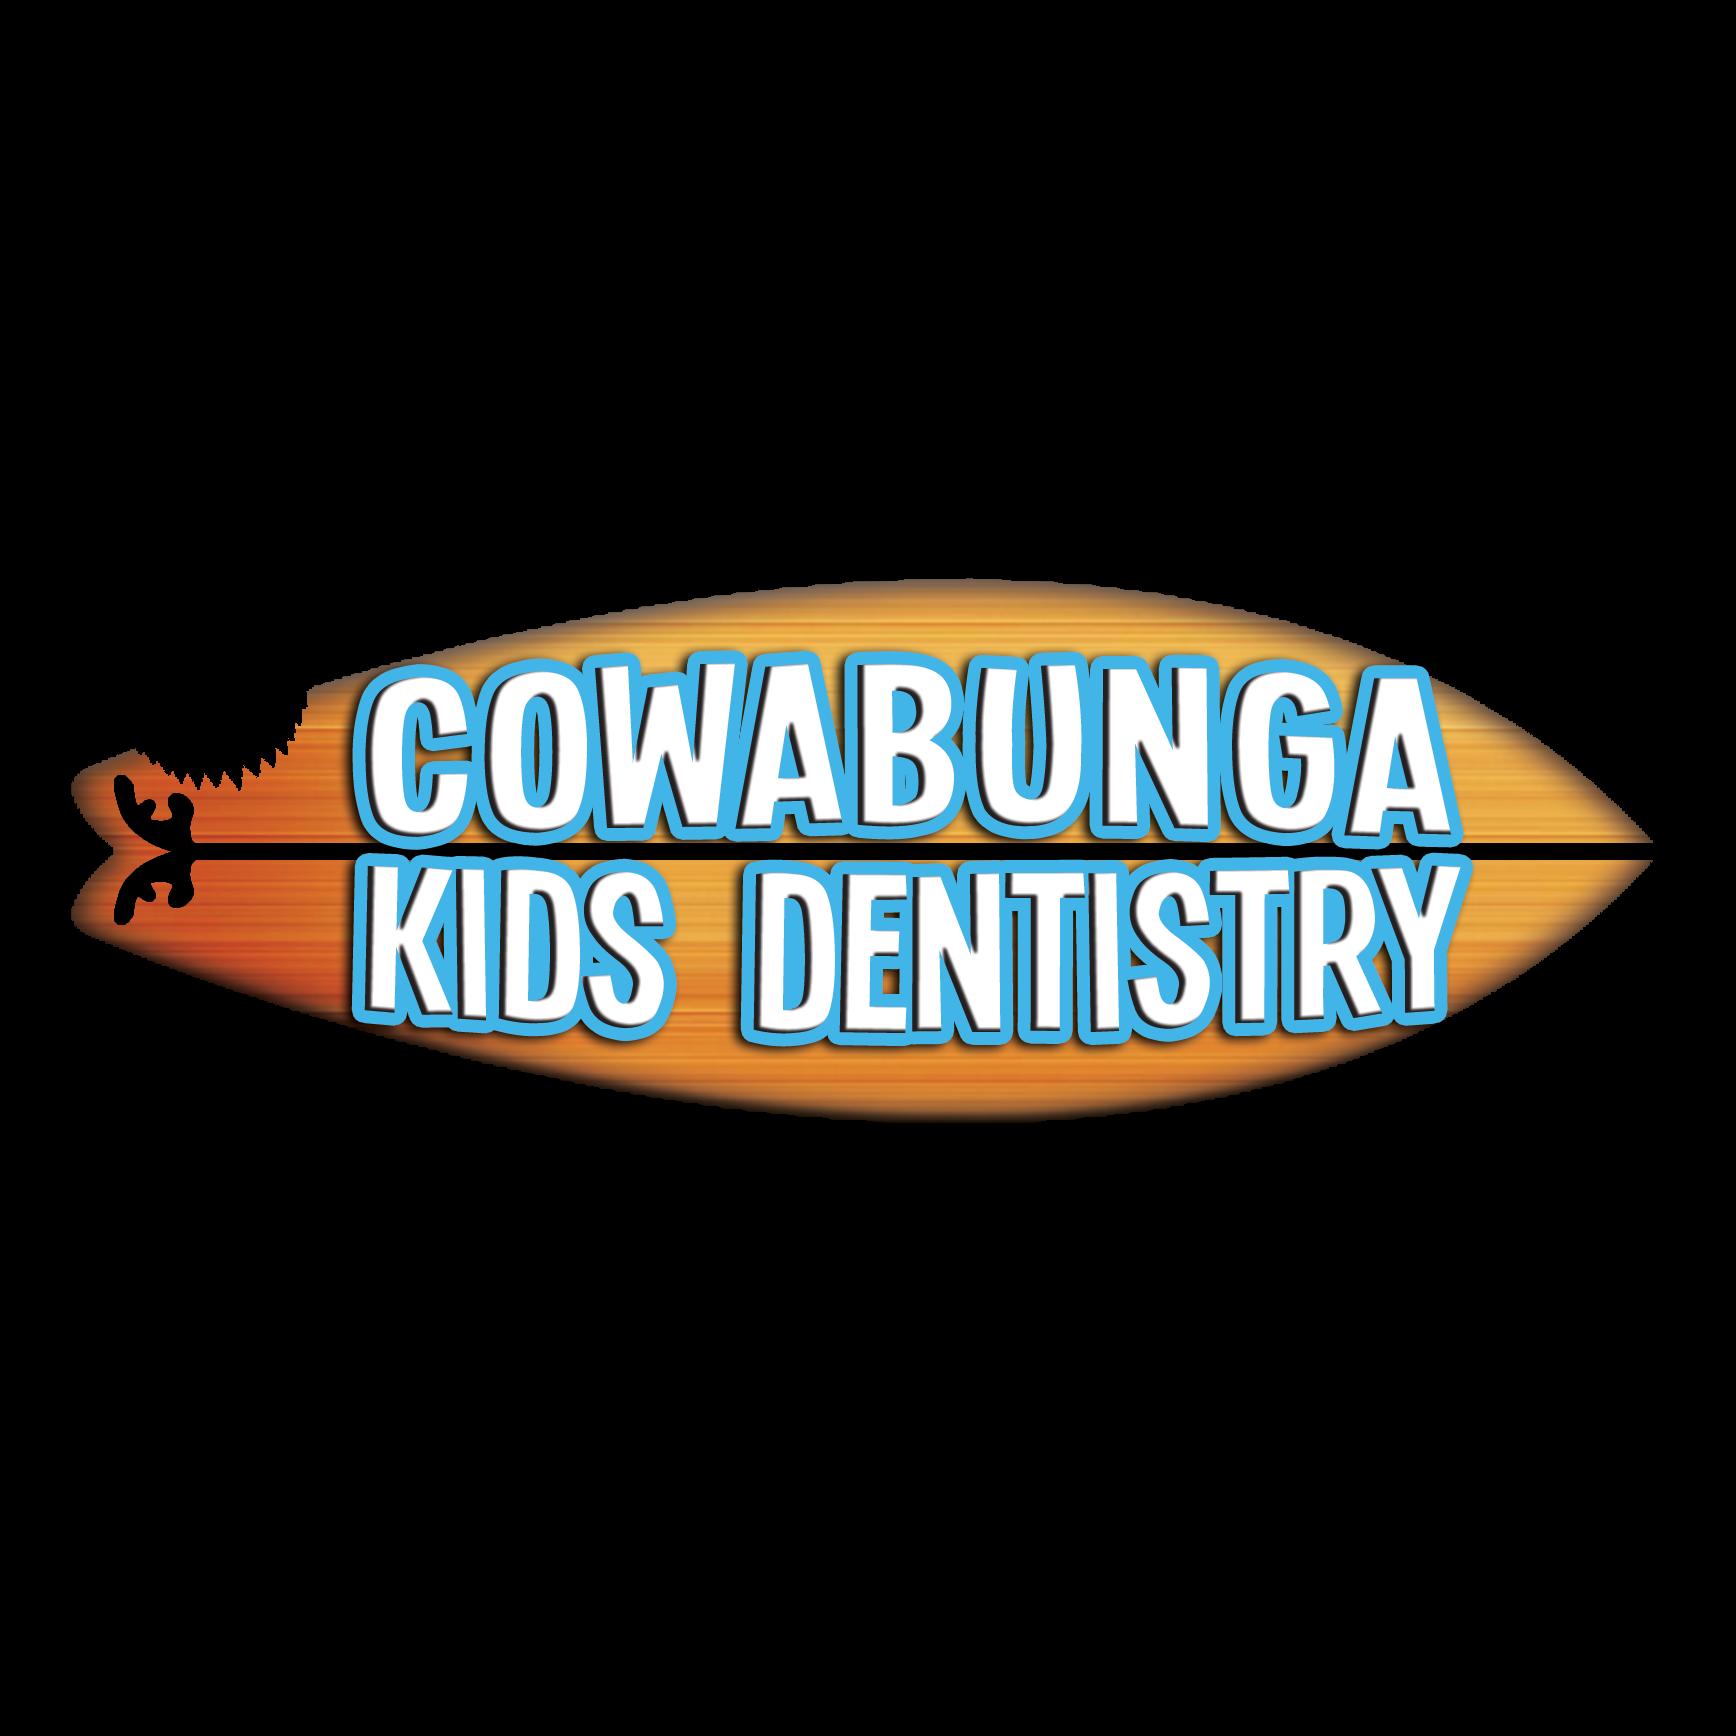 Cowabunga Kids Dentistry